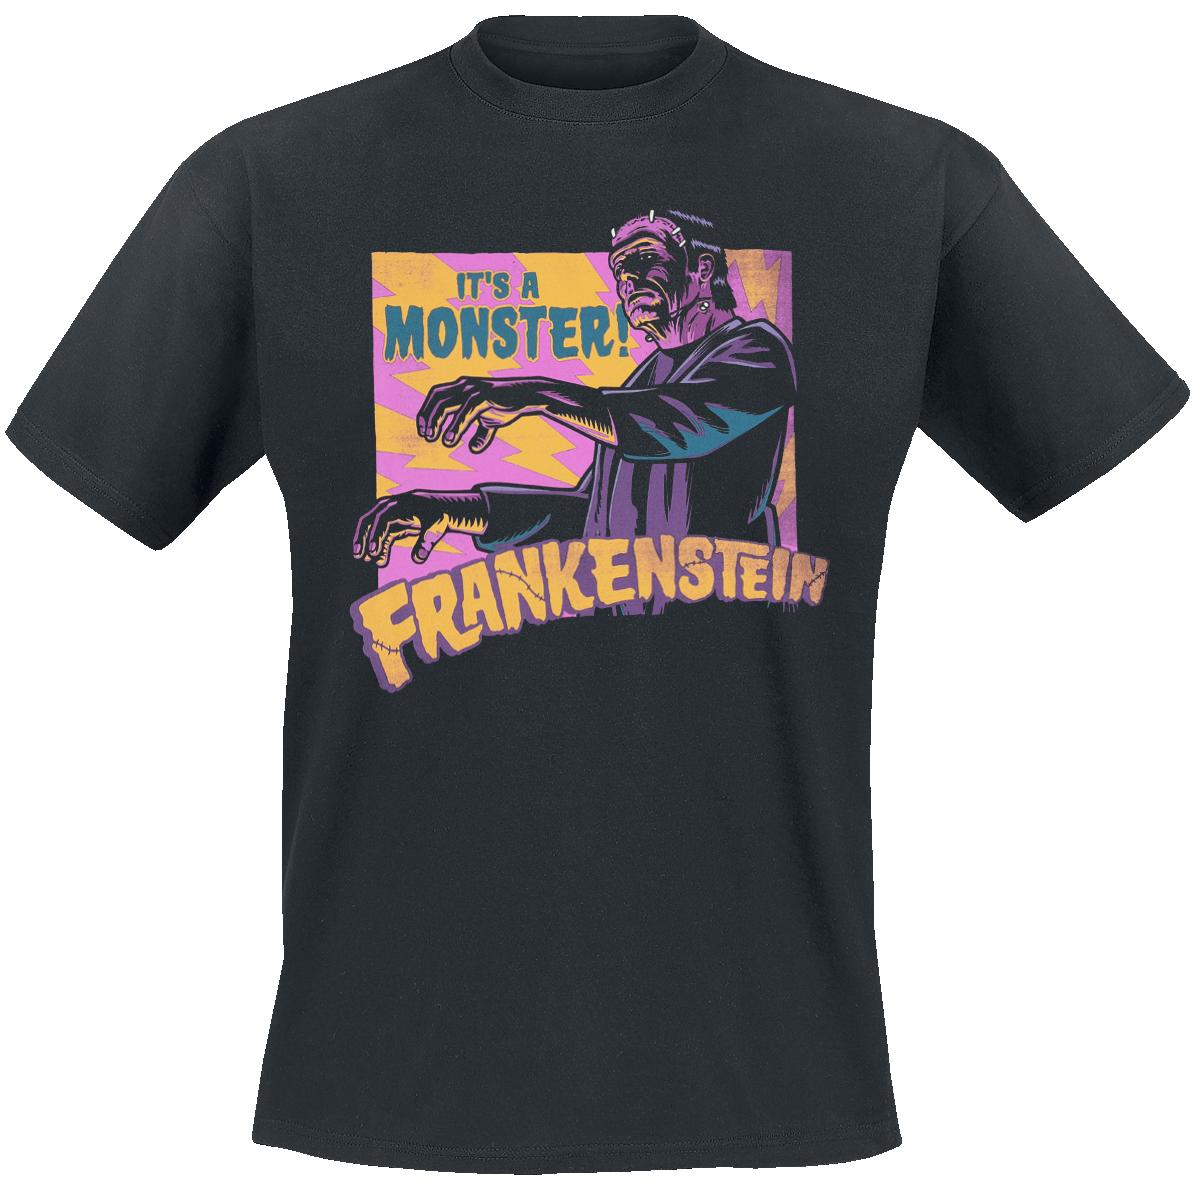 Frankenstein - It's A Monster! - T-Shirt - black image